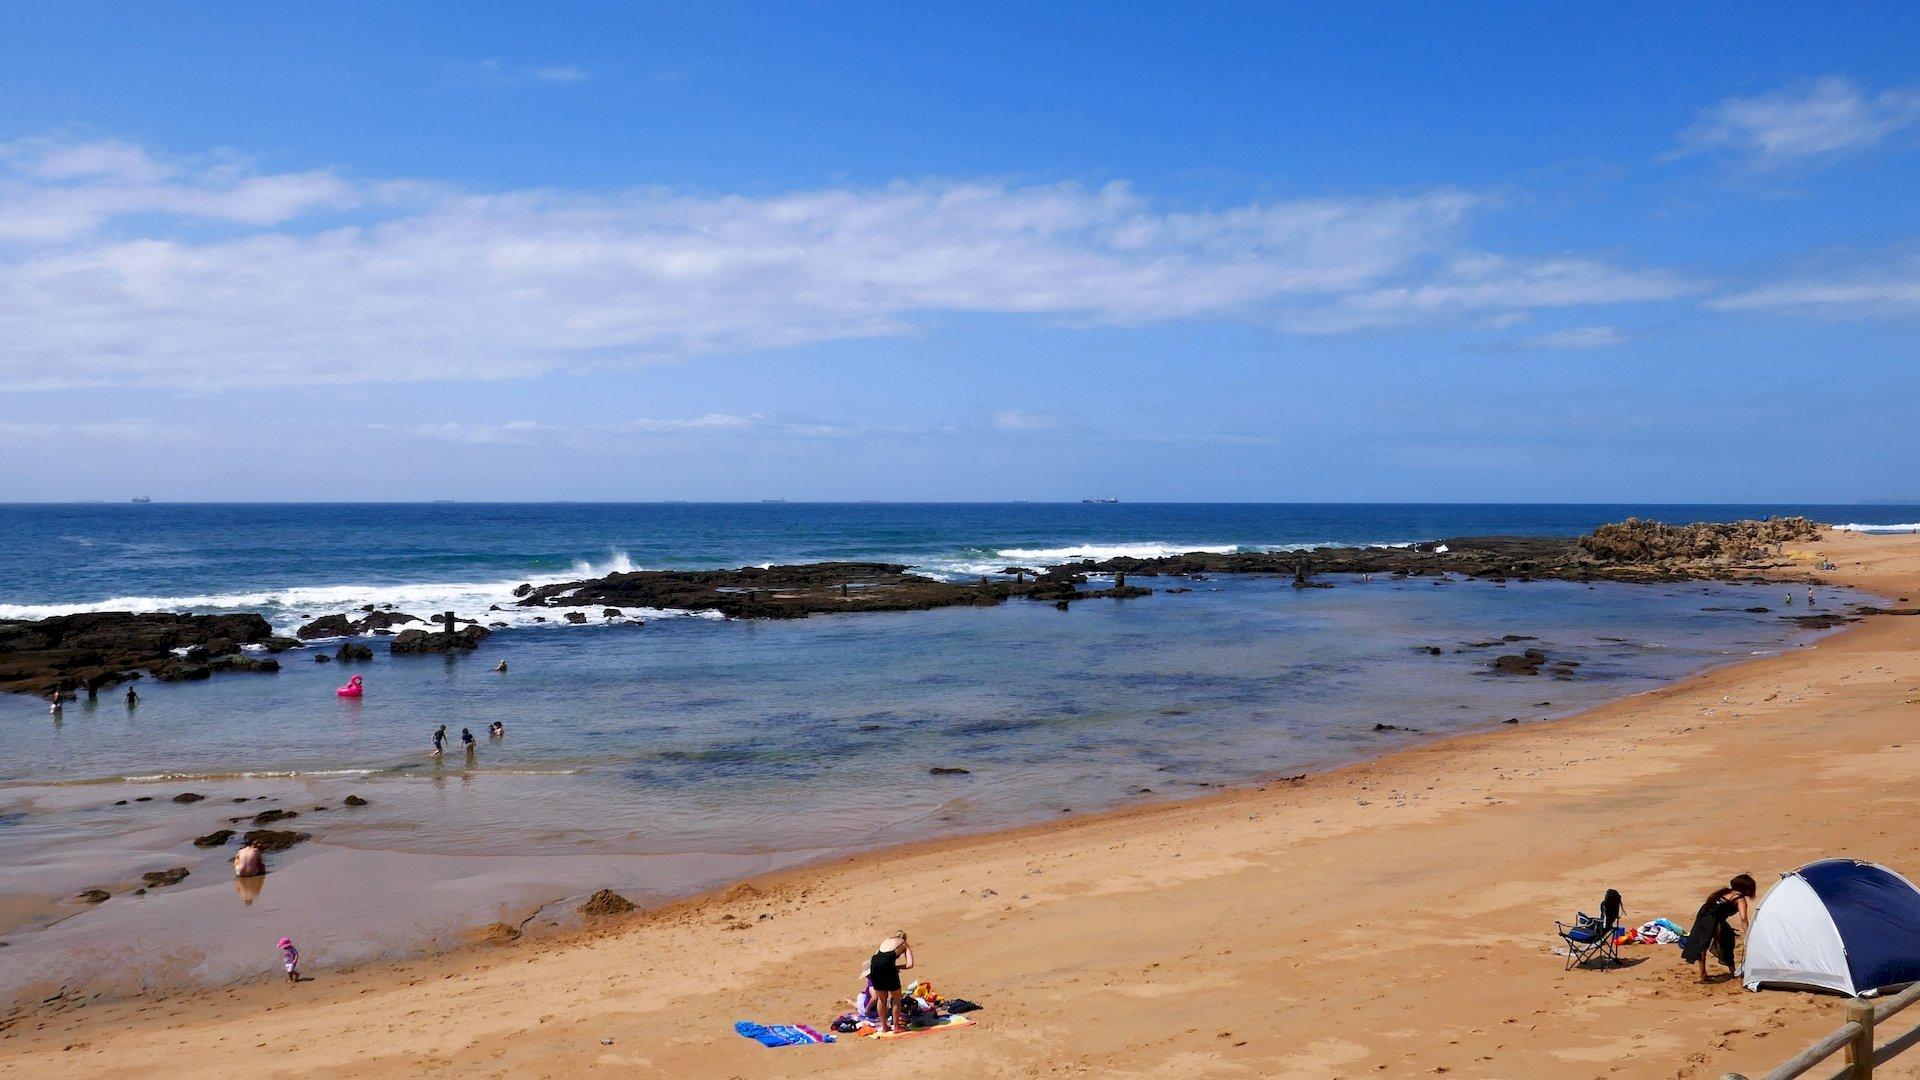 Umdloti tidal rock pool swimming area